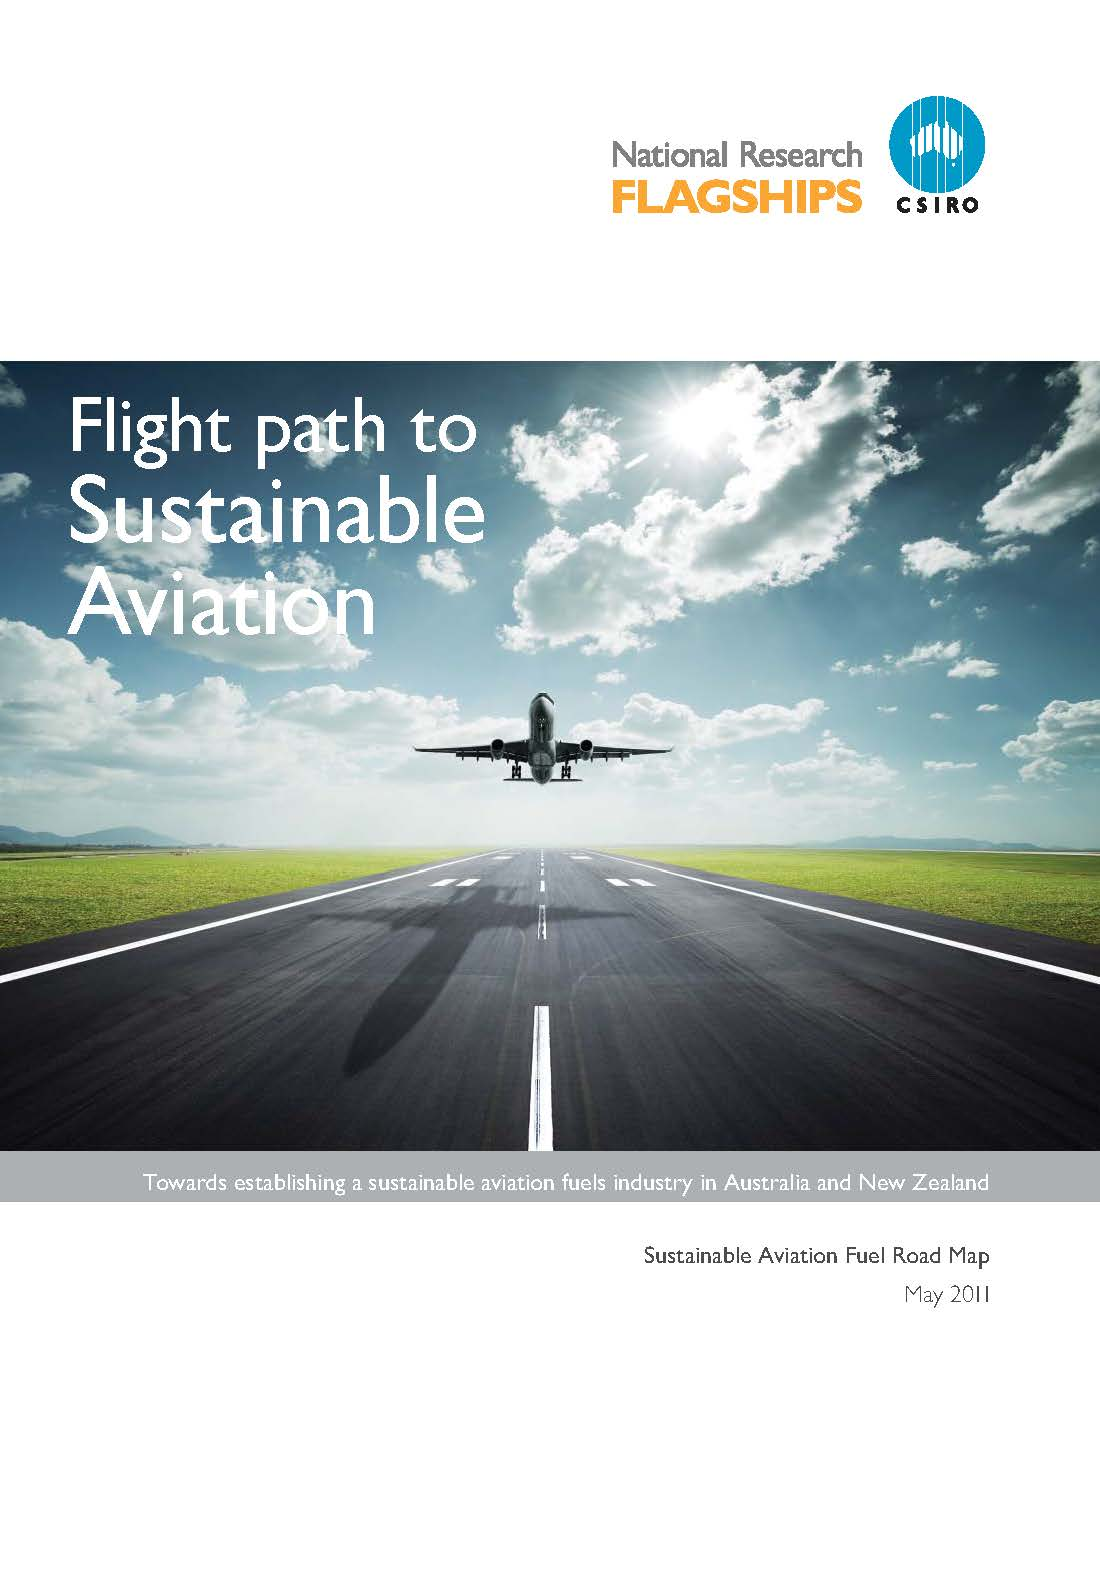 FlightpathSustainableAviation_ETF_pdf Standard 1.jpg